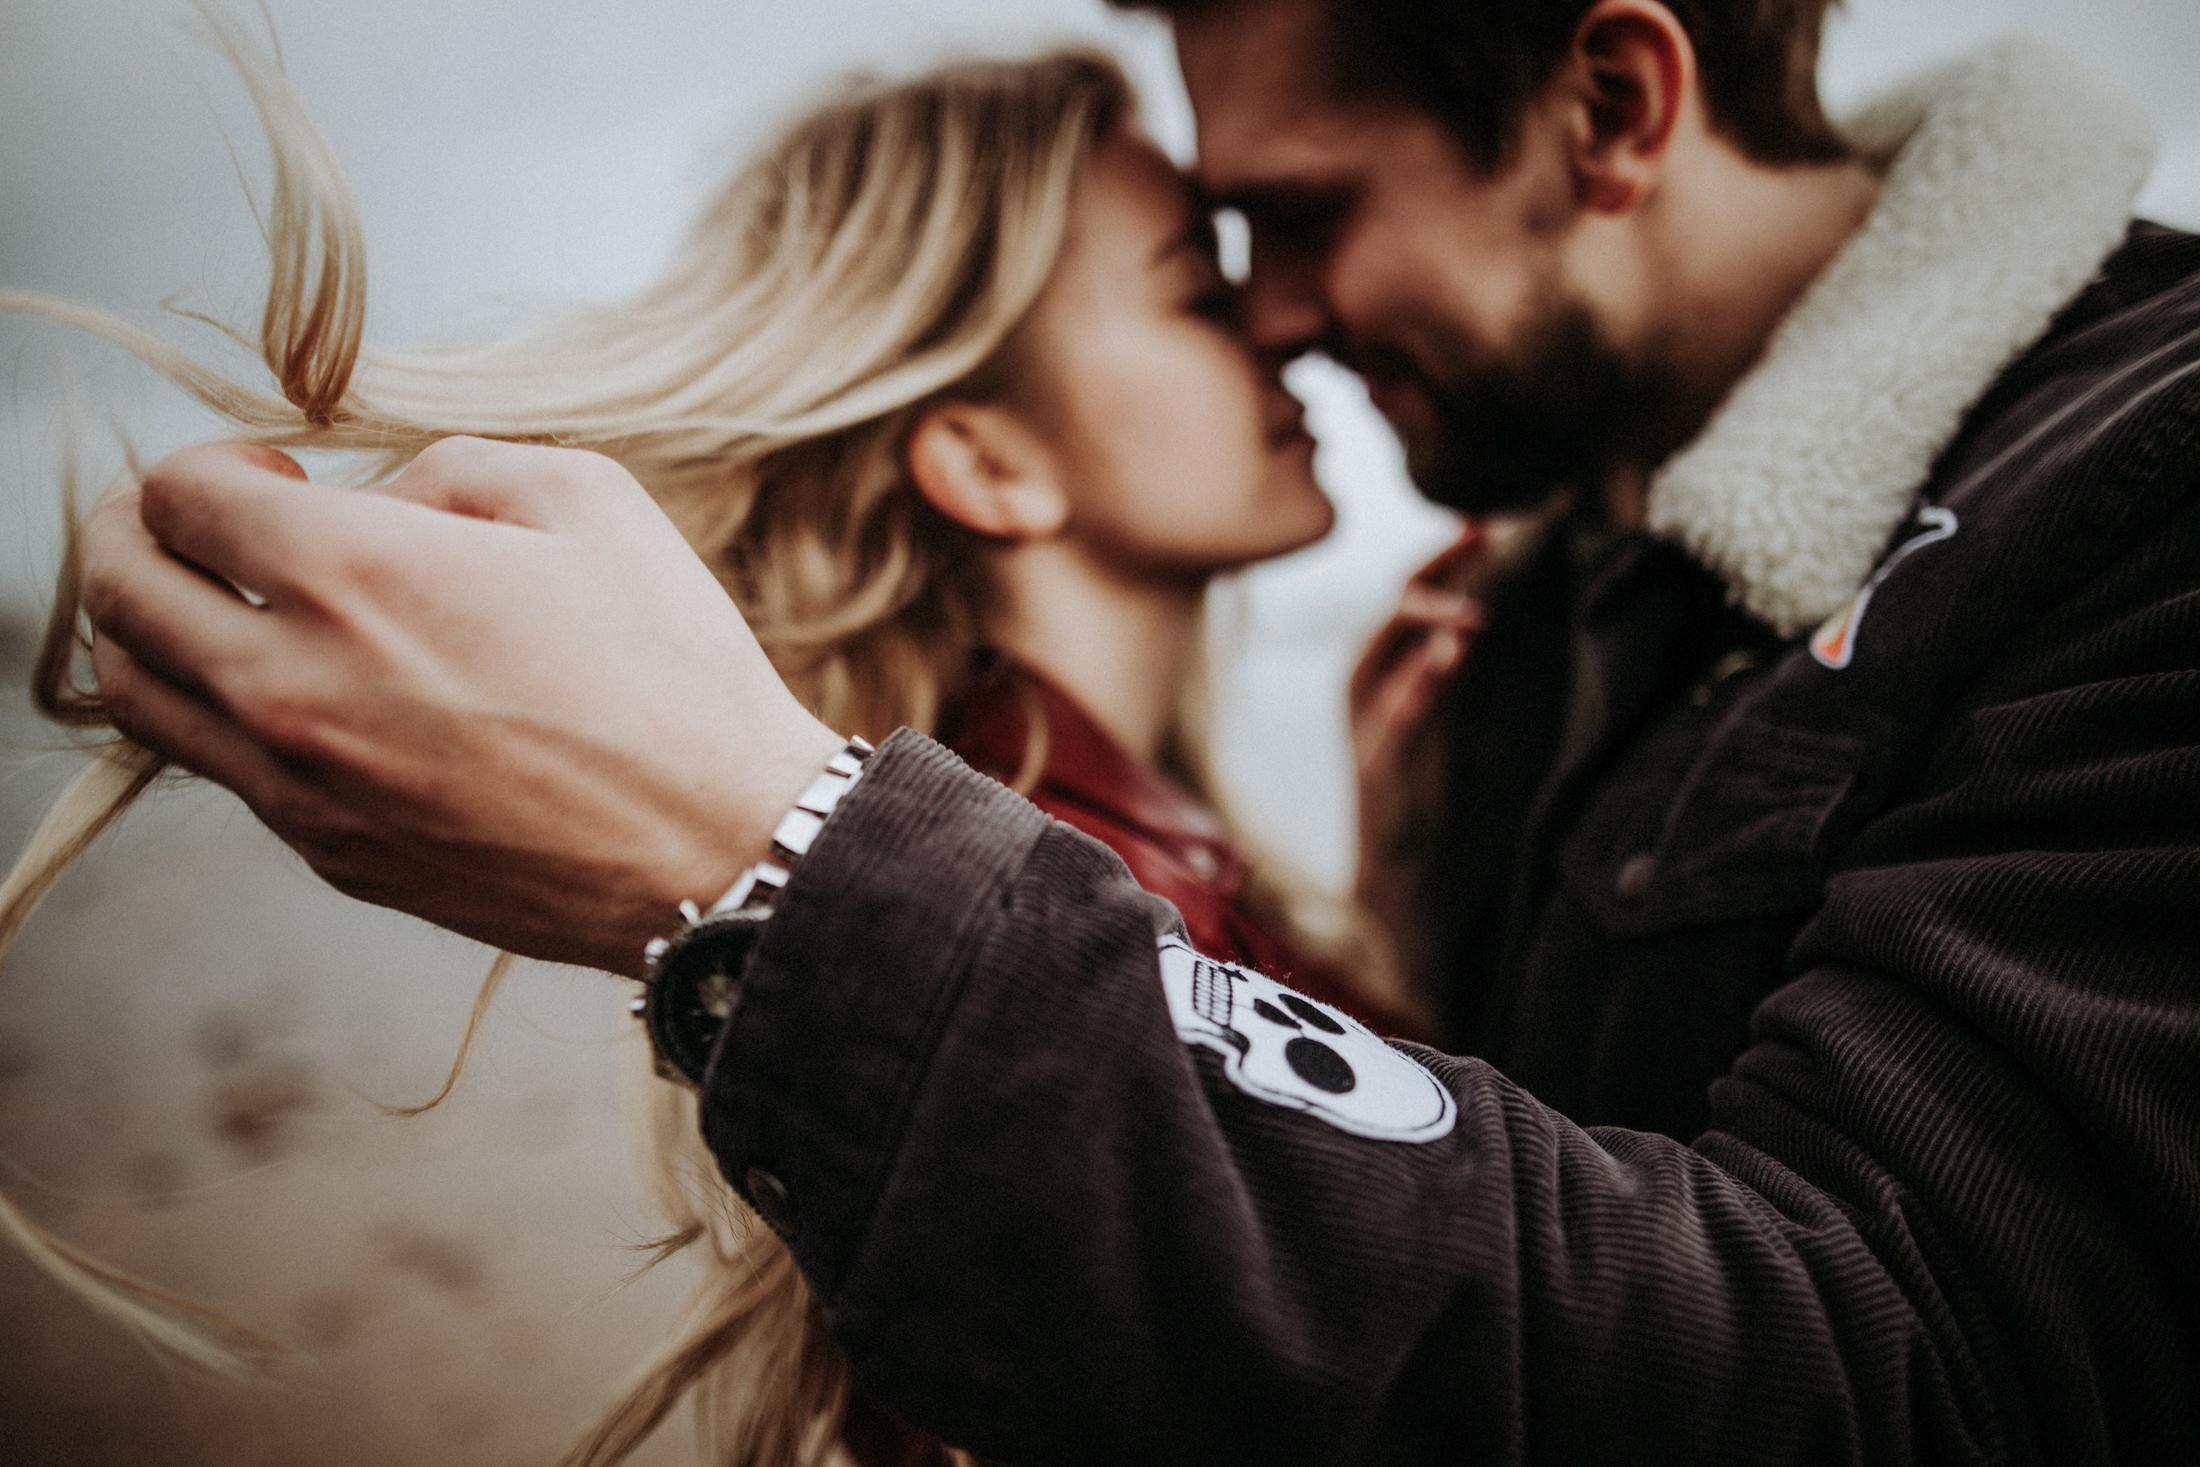 Wedding_Photographer_Mallorca_DanielaMarquardt_Photography_CanaryIslands_Lanzarote_Iceland_Tuscany_Santorini_Portugal_NewYork_Spain_Elopement_Hochzeitsfotograf_CK68